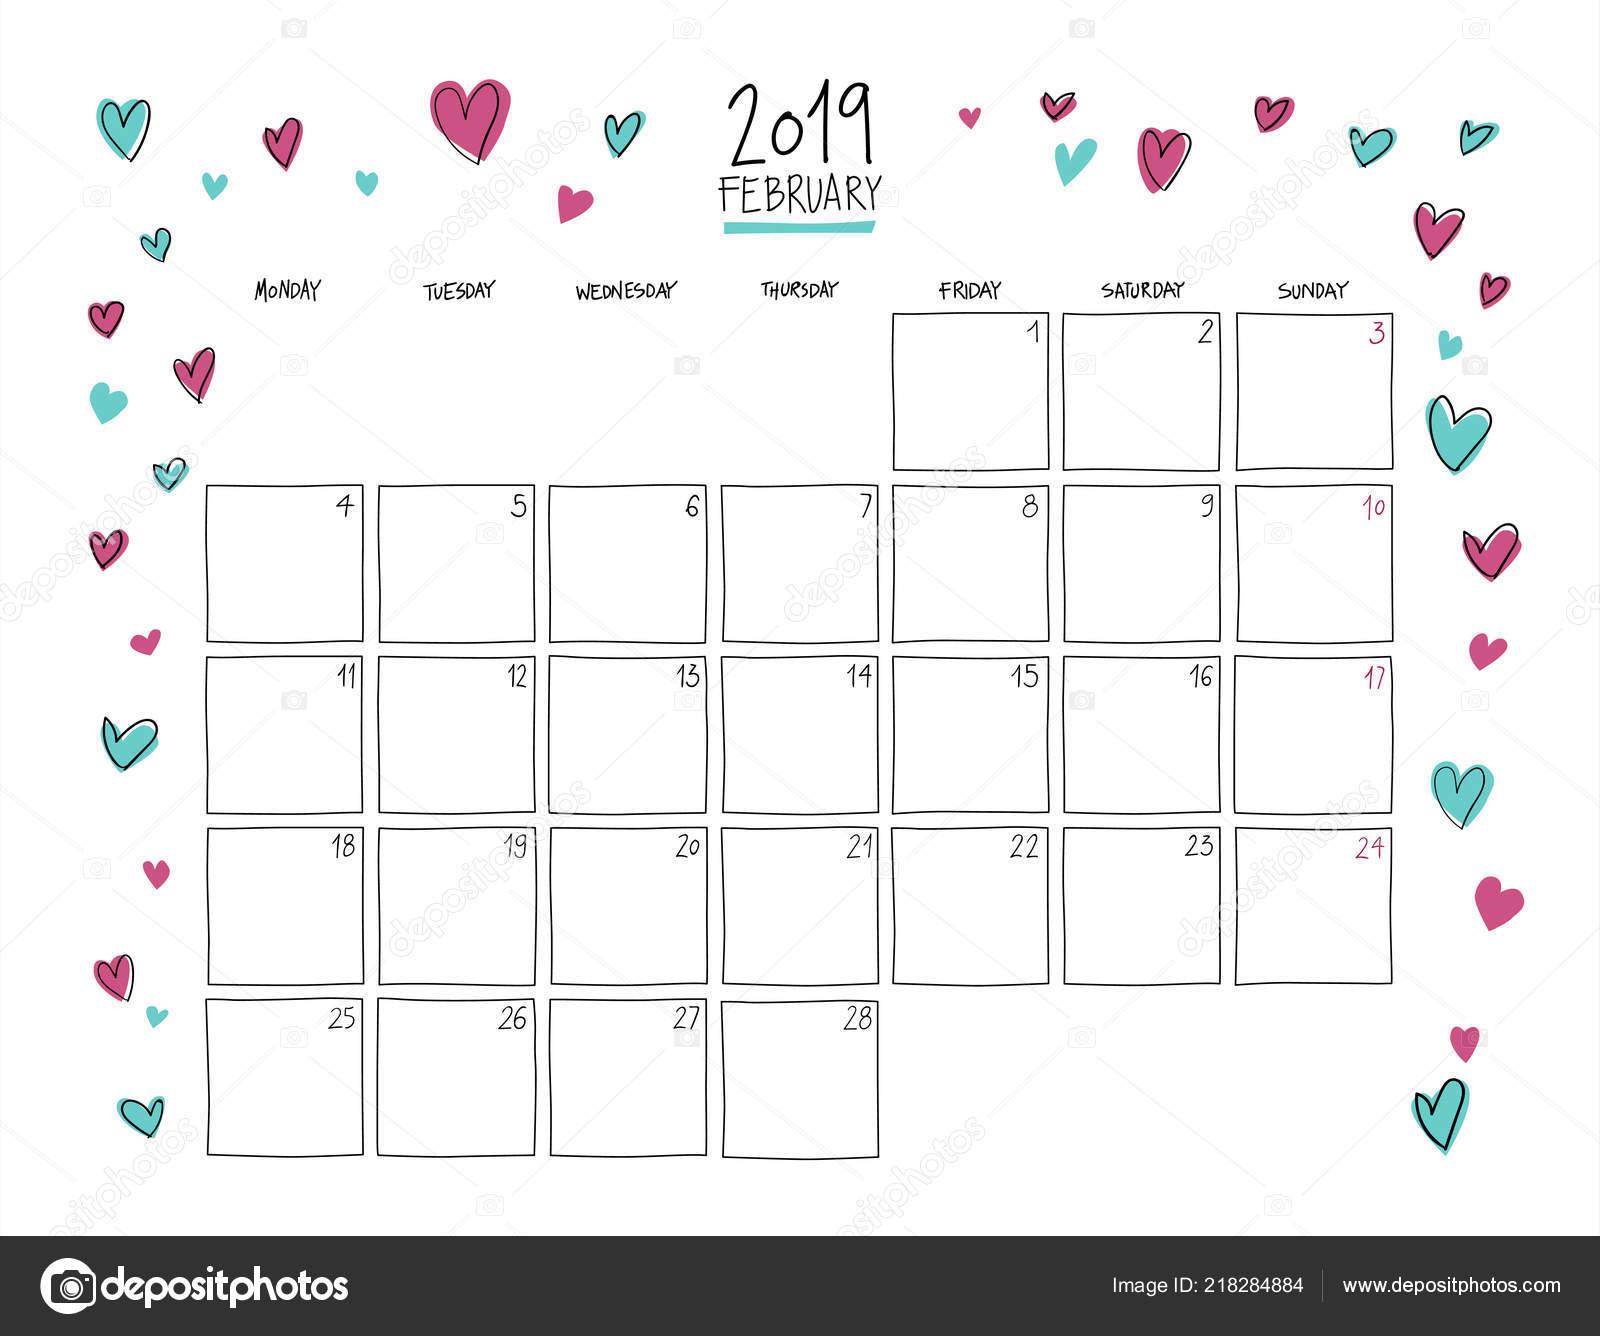 60b5c5b7f Calendario de pared de febrero de 2019. Plantilla horizontal de dibujo  colorido.